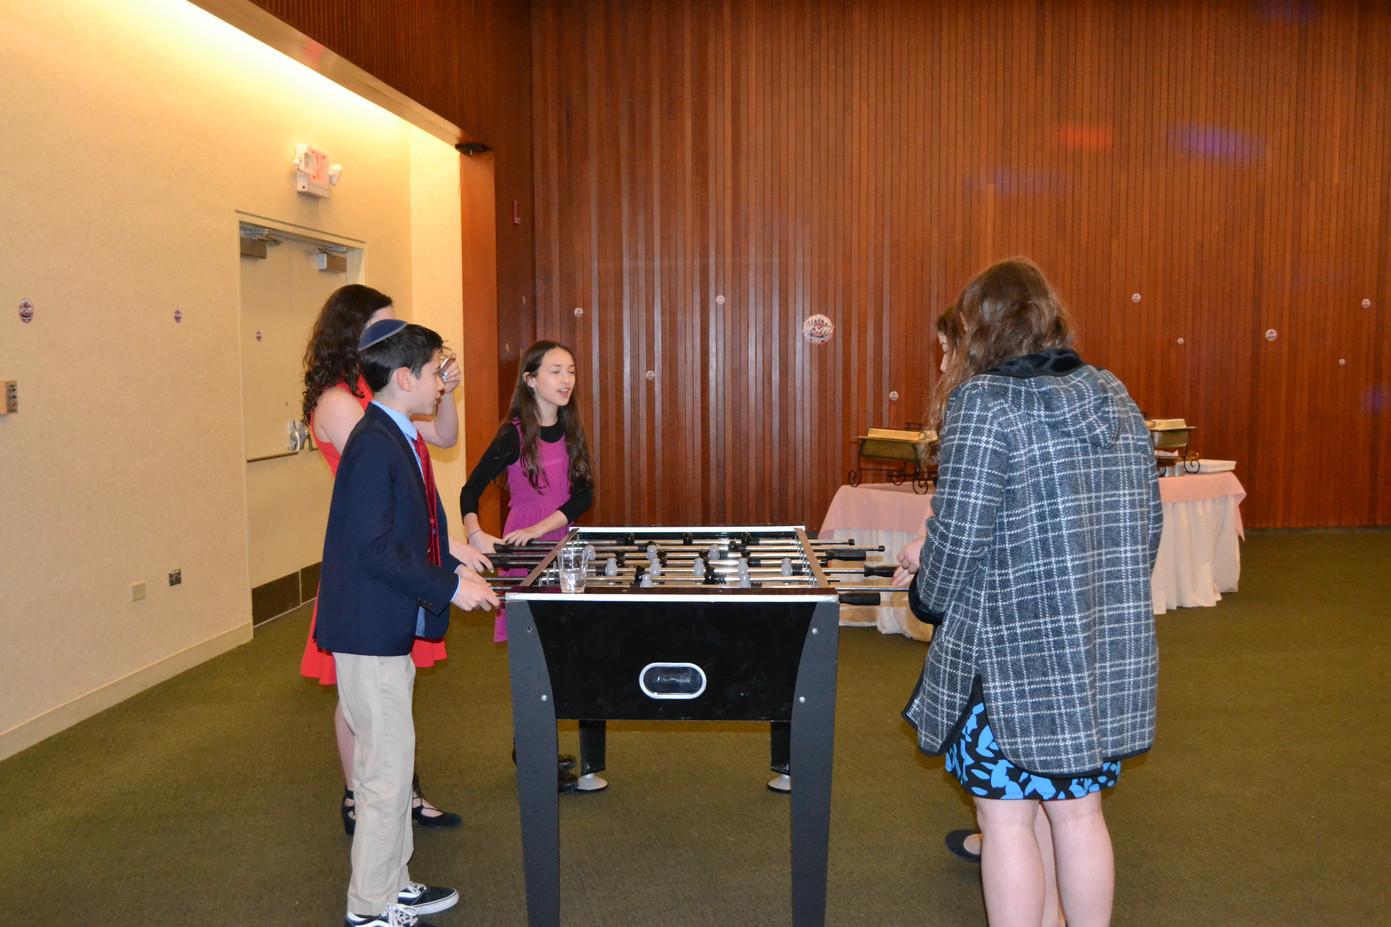 Kids-Playing-Foosball-Table-Game.JPG